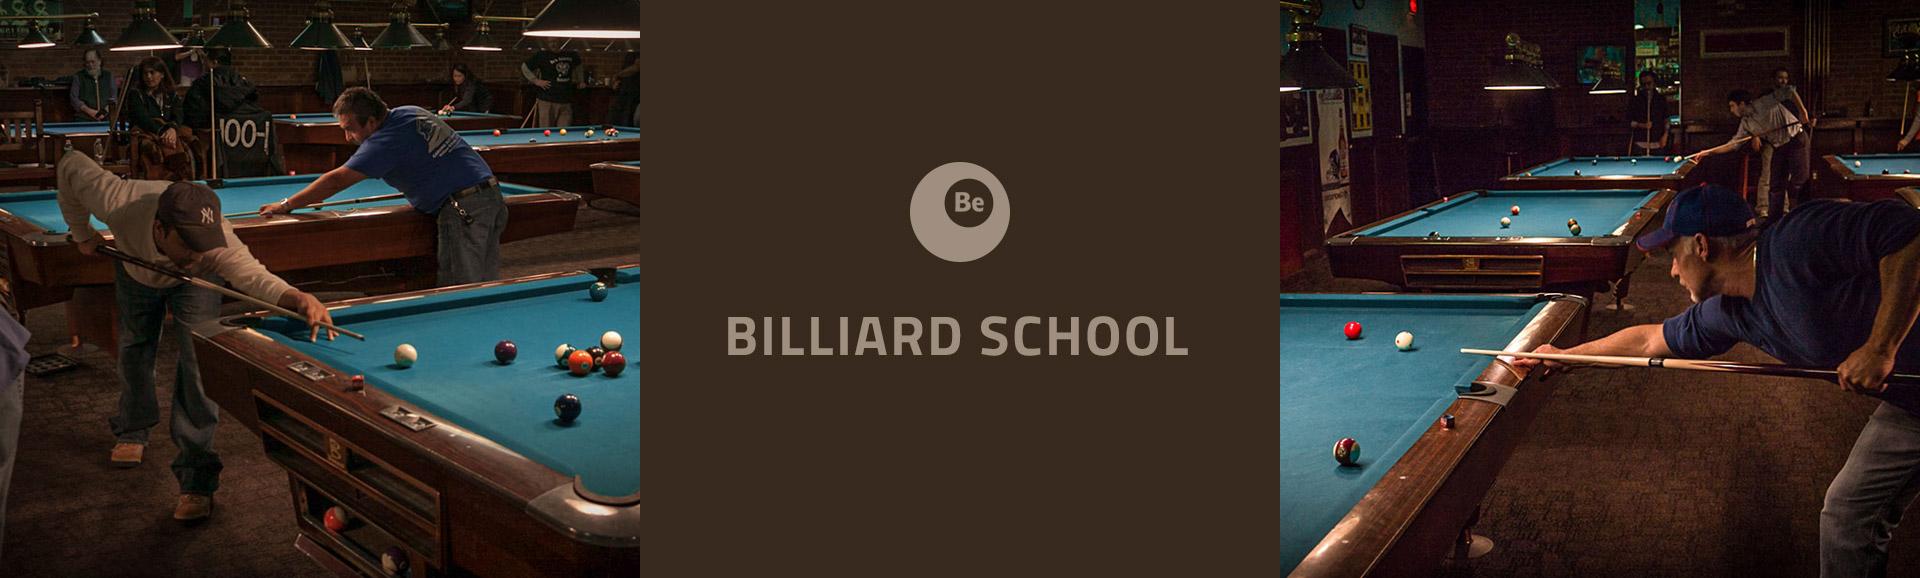 home_billiard_school